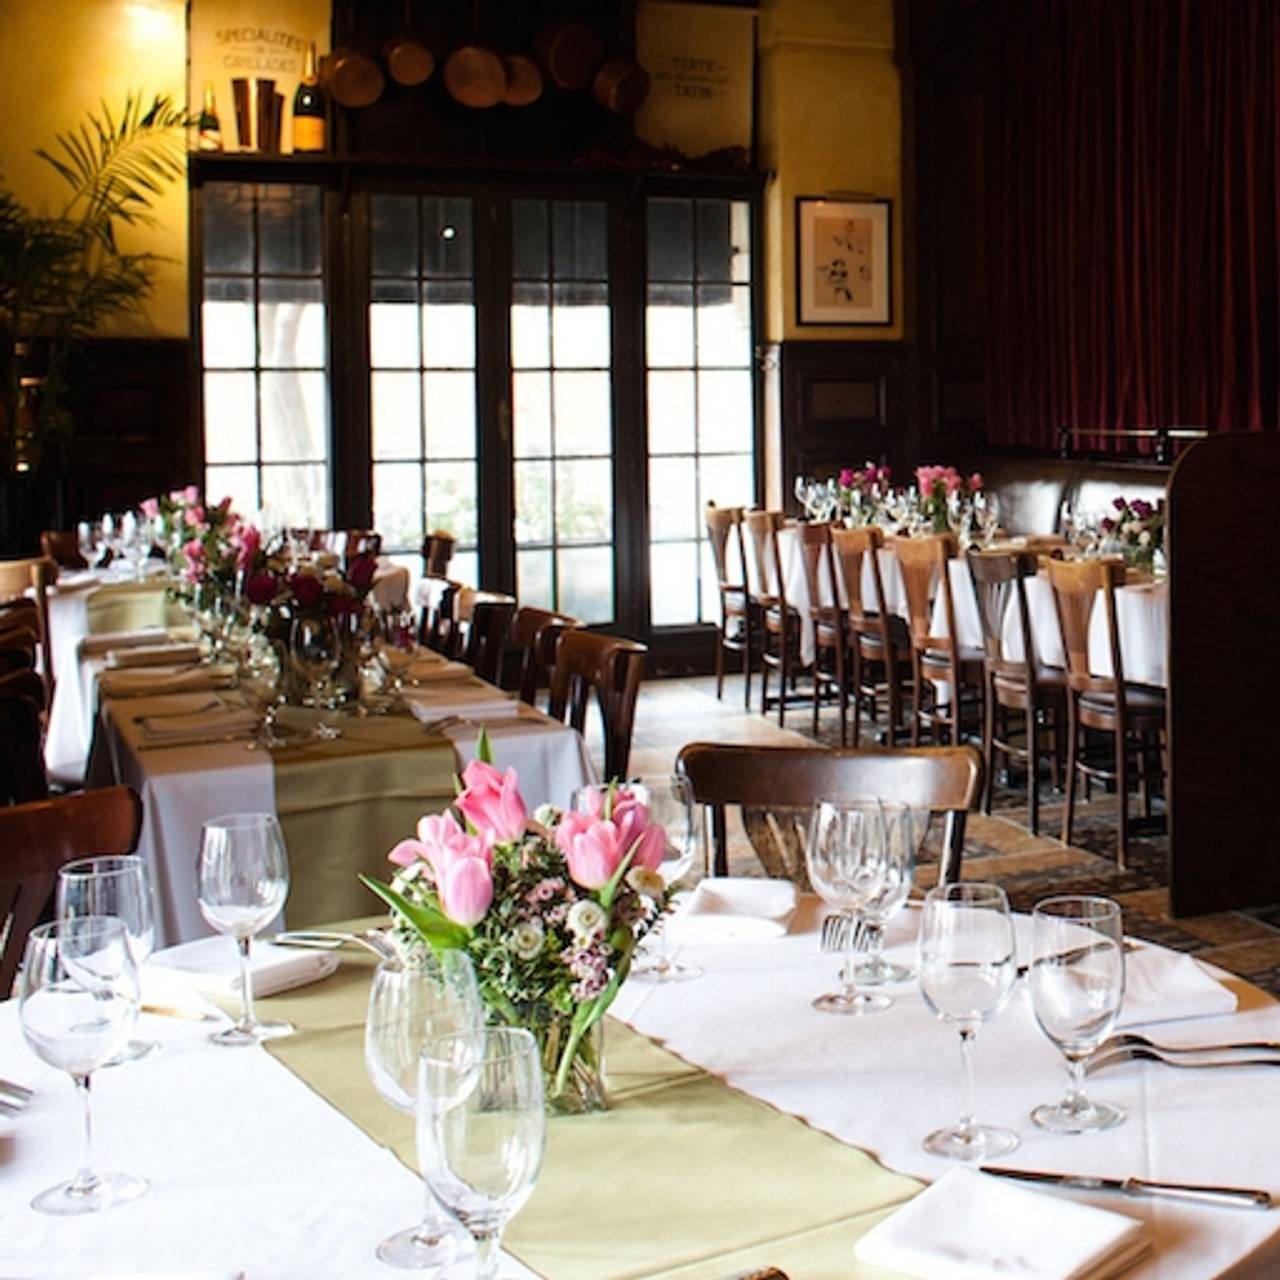 Mon Ami Gabi Restaurant Chicago Il Opentable